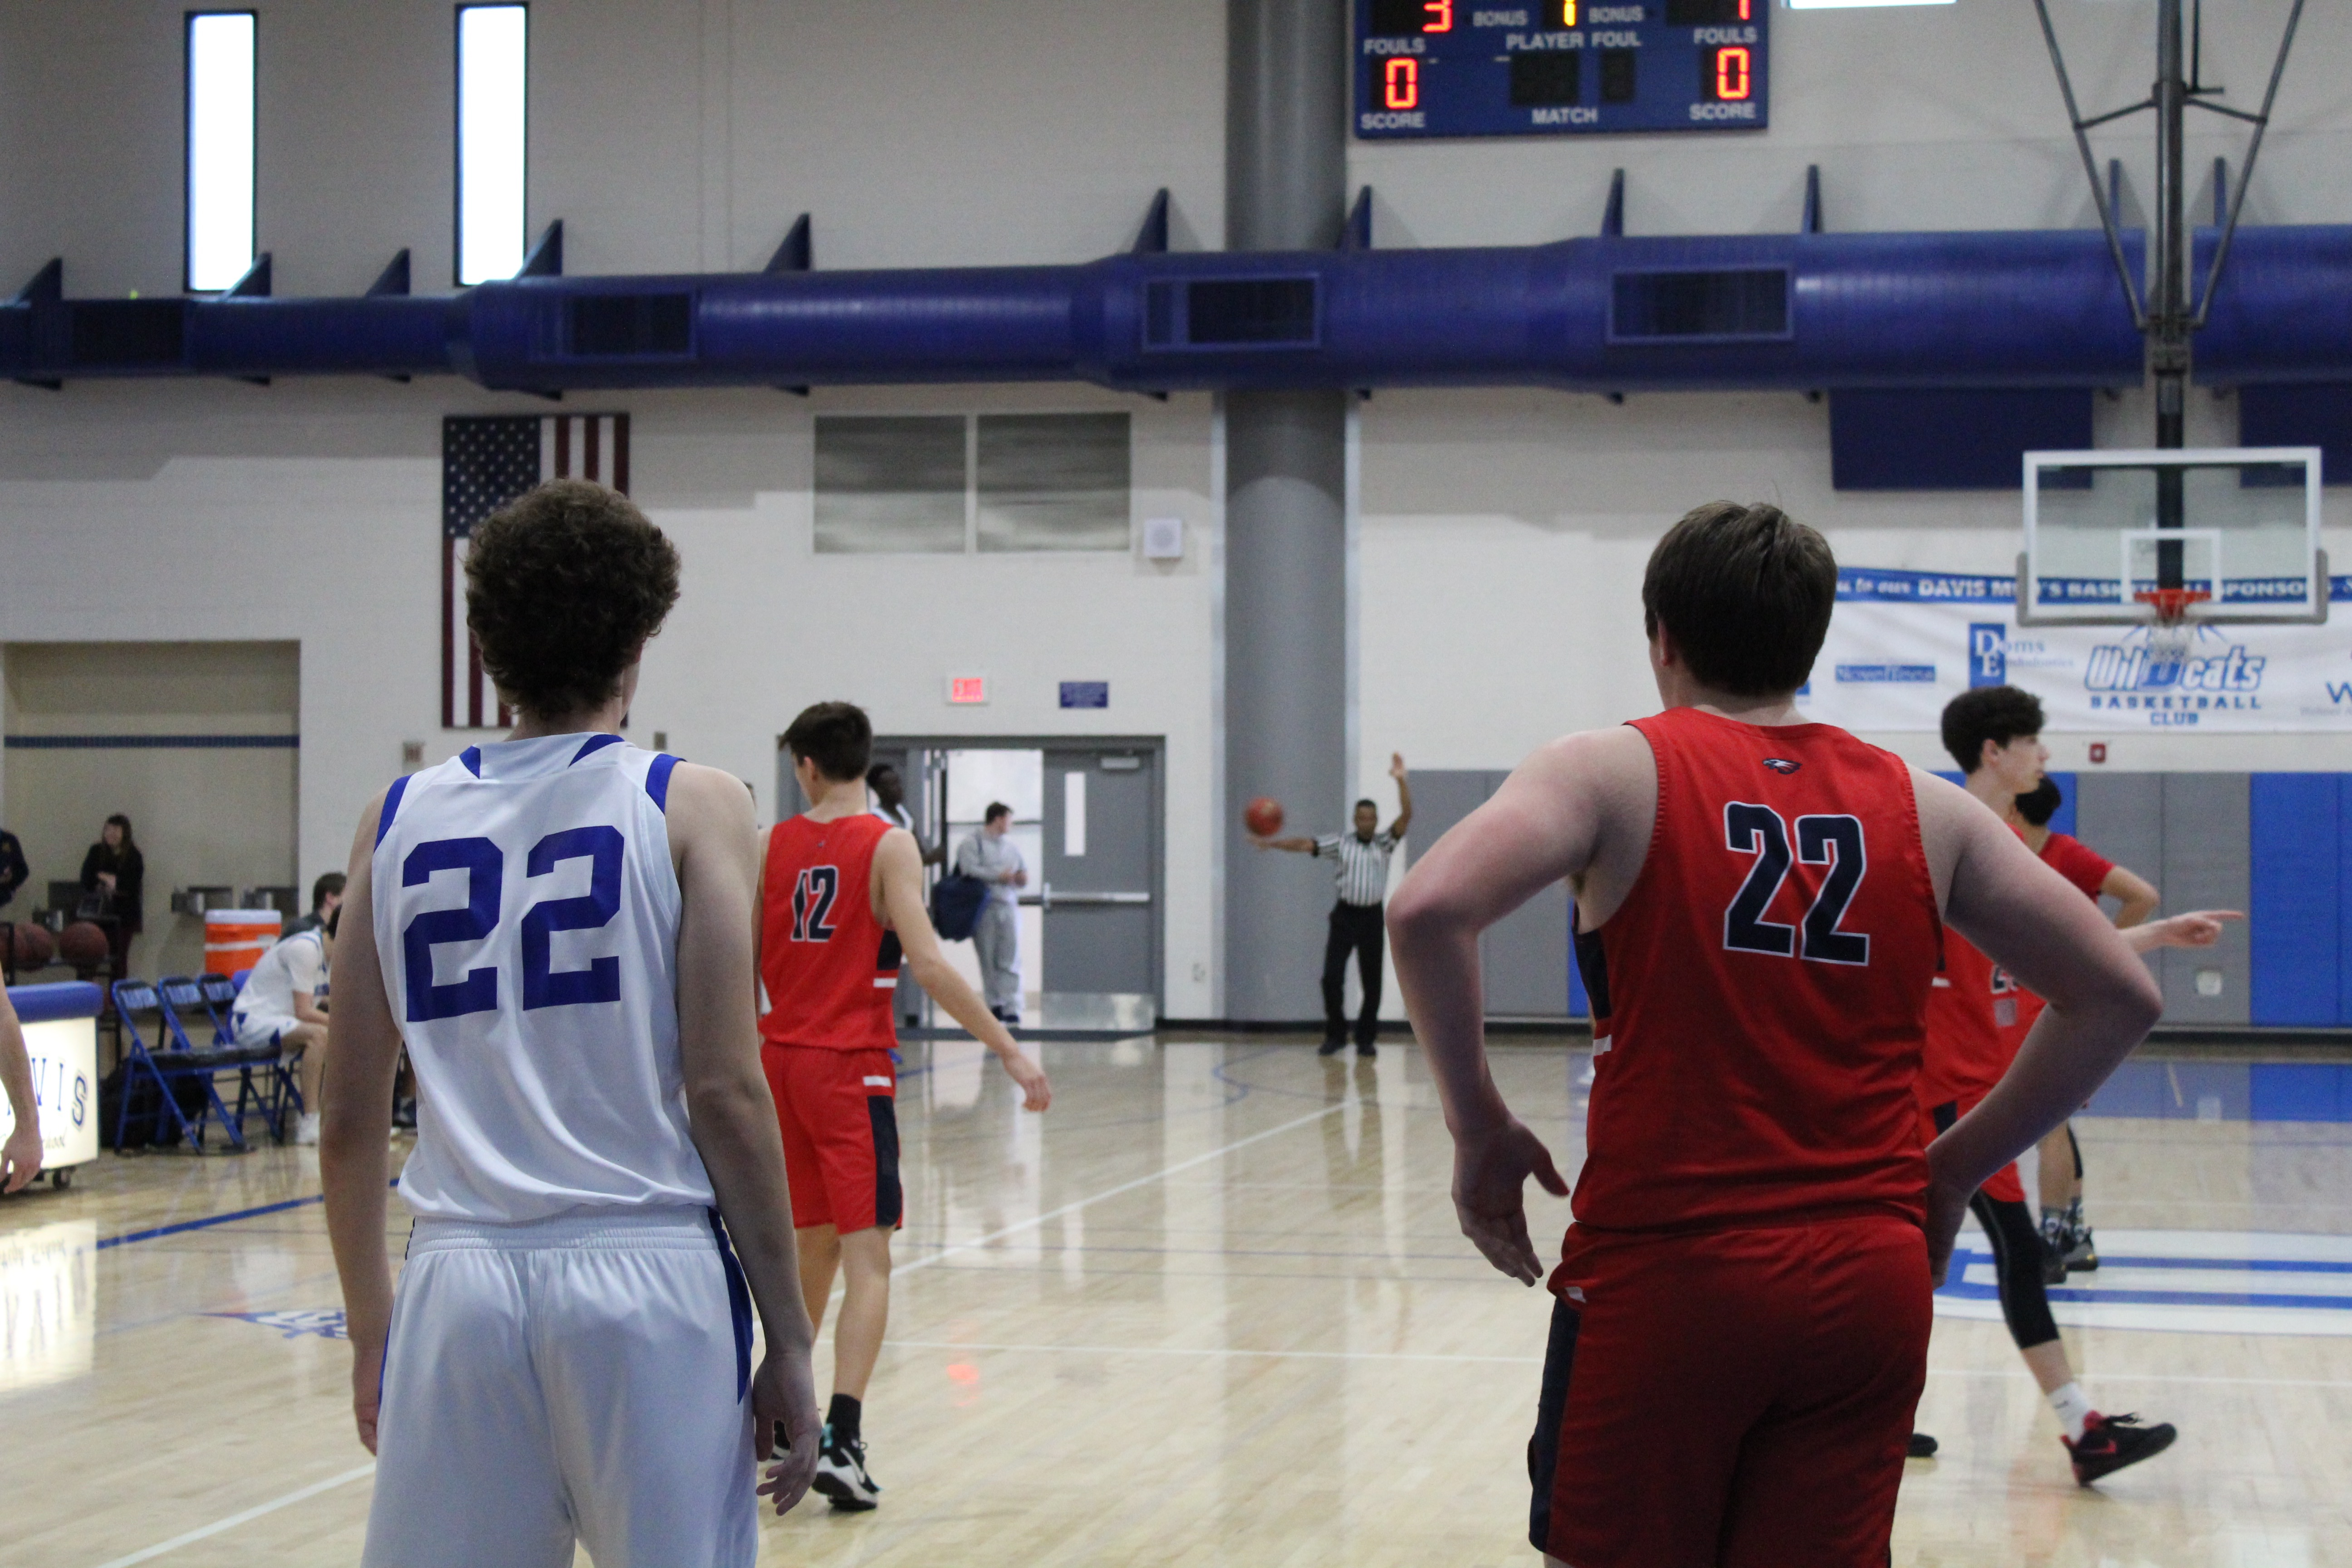 Junior Ryan Hakl sizes up his opponent.